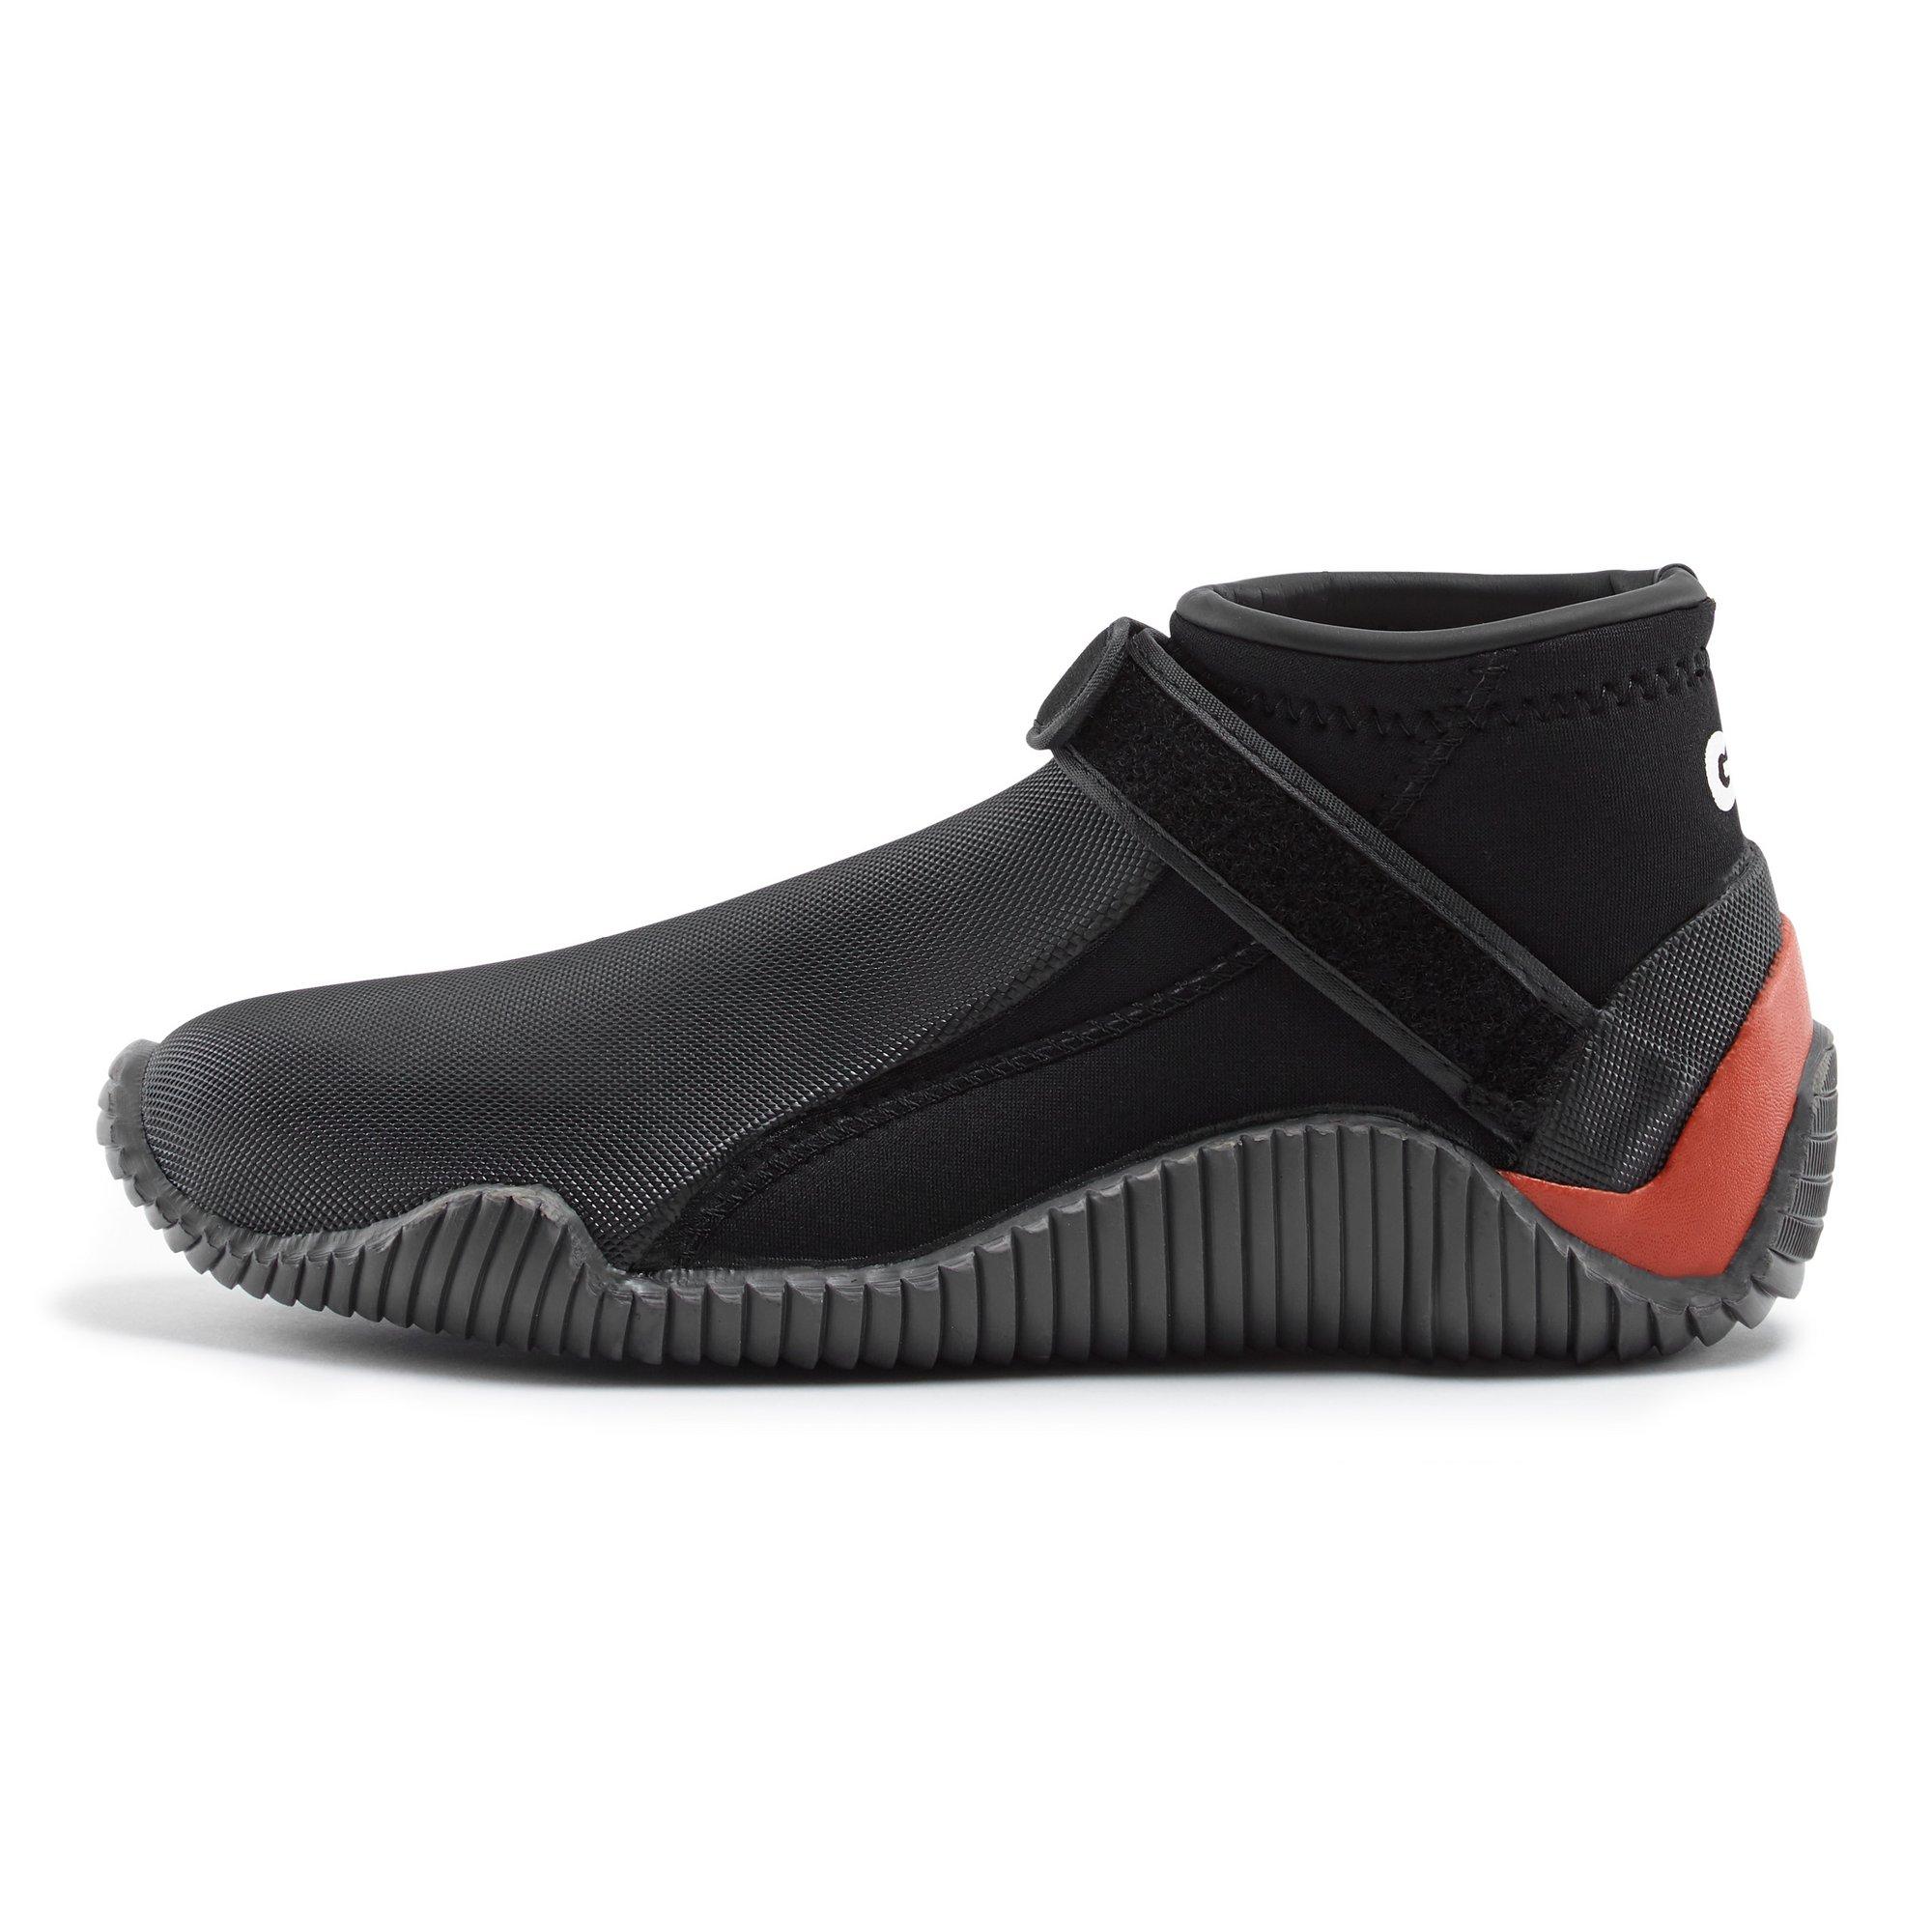 Aquatech Shoe - 963-BLK20-1.jpg